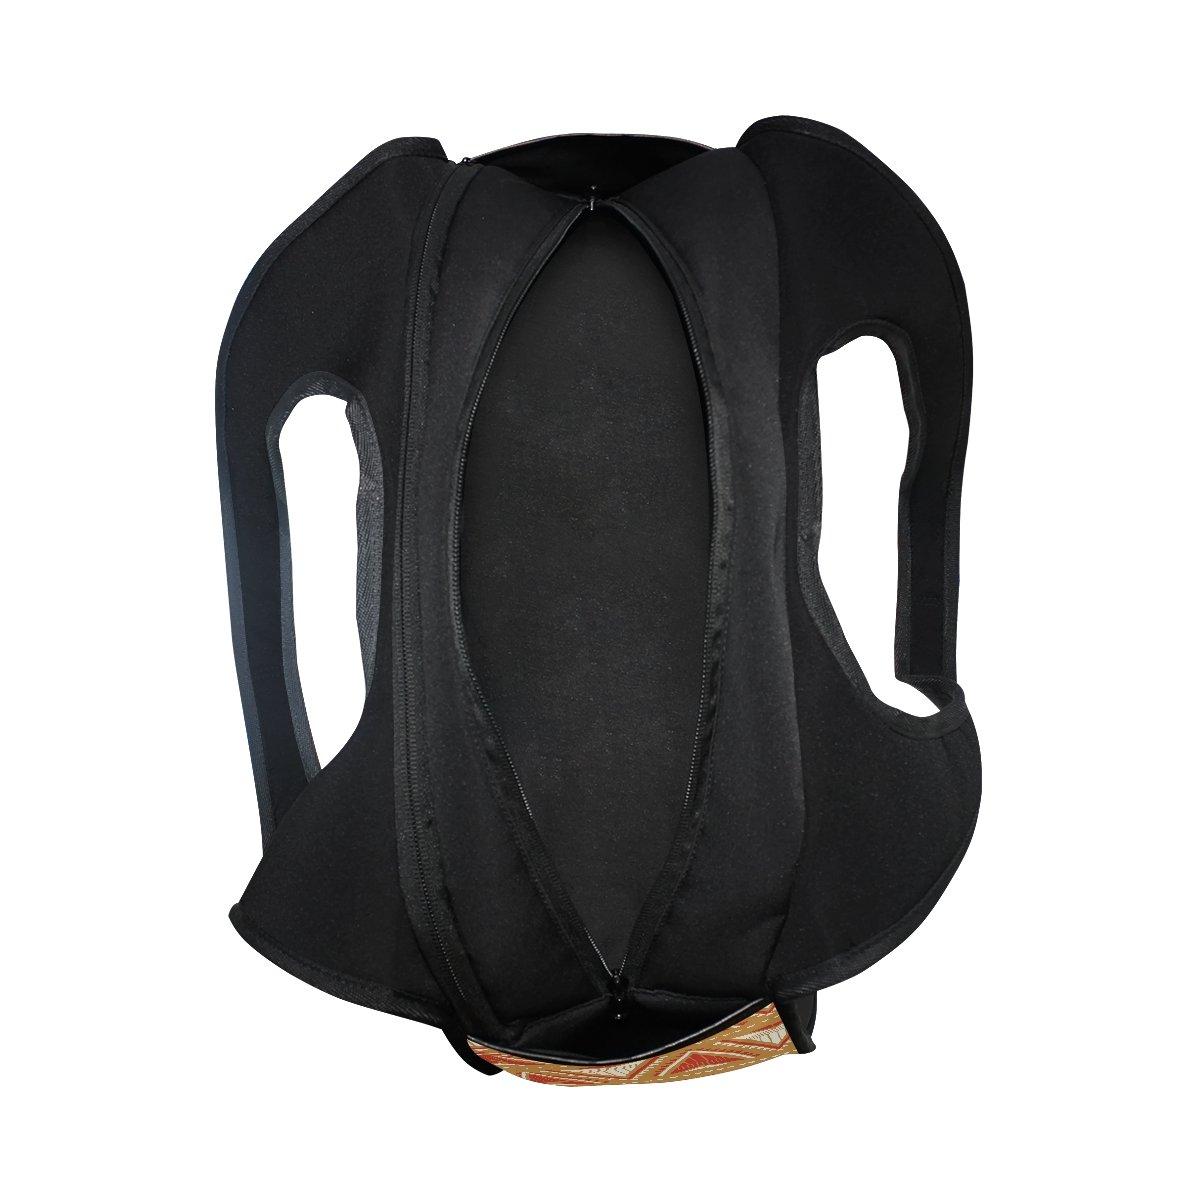 AHOMY Canvas Sports Gym Bag Chevron Travel Shoulder Bag